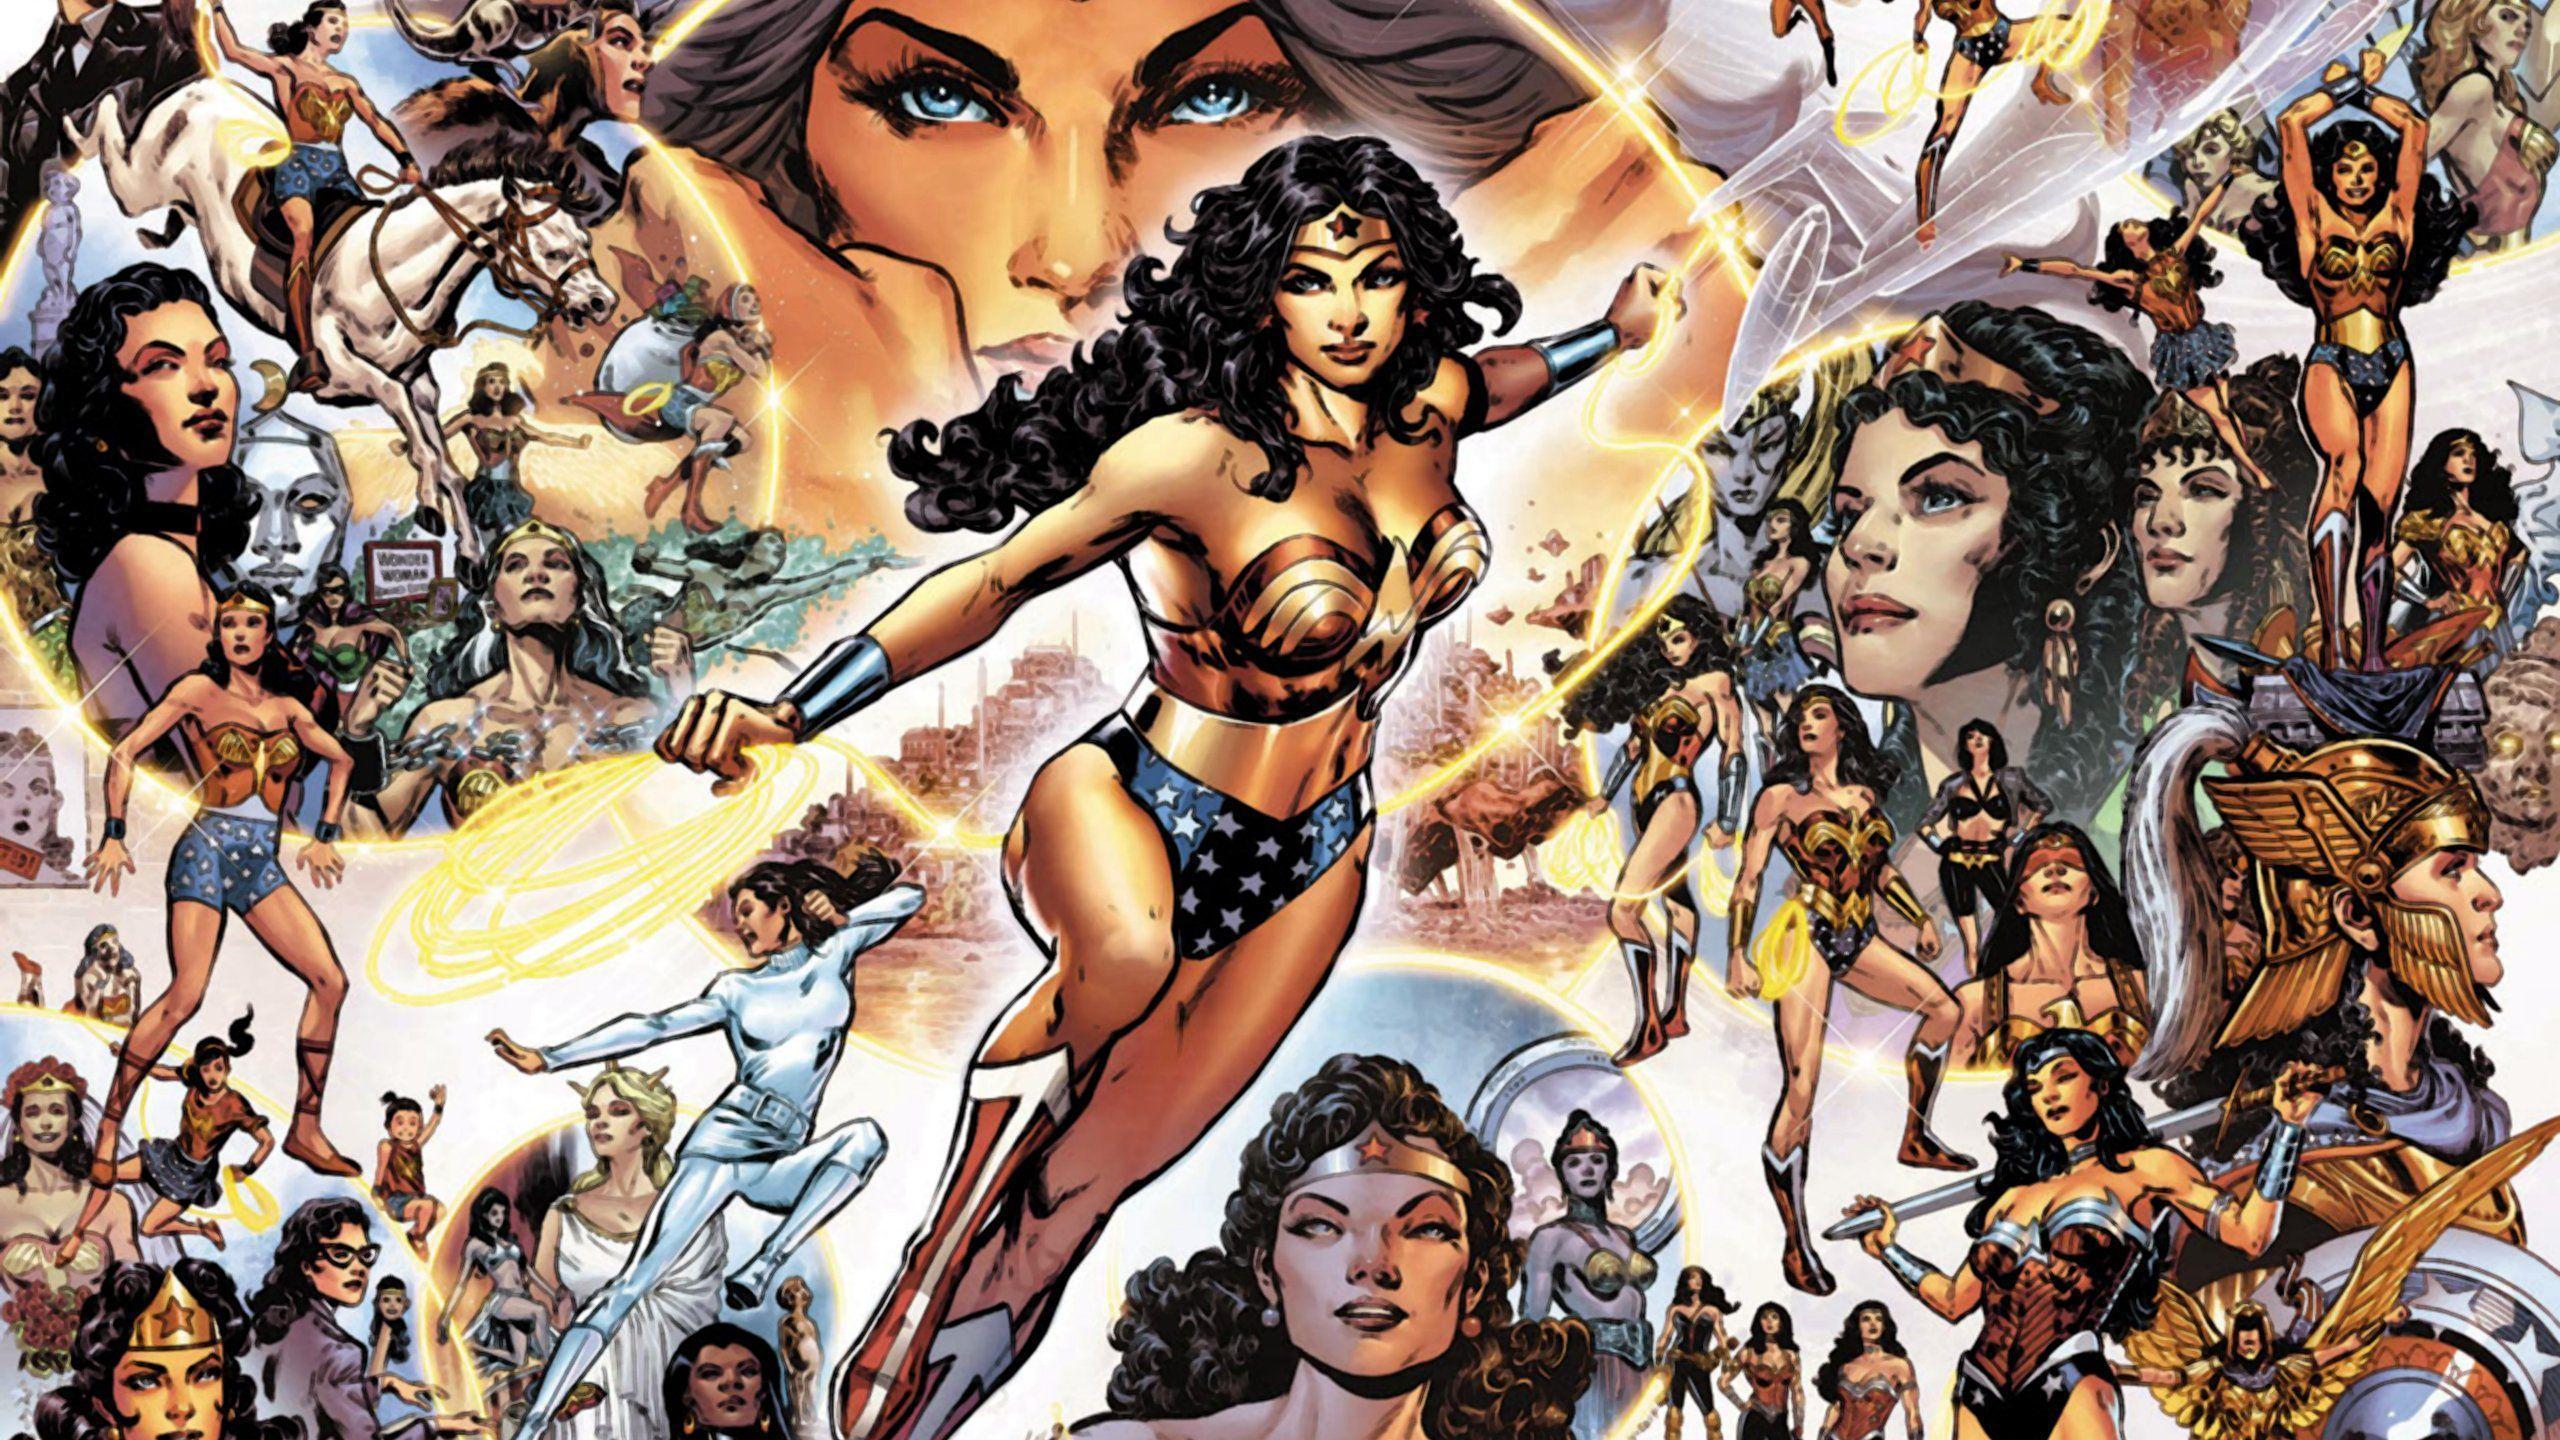 Superman and Wonder Woman Selfie wallpaper – wallpaper free download